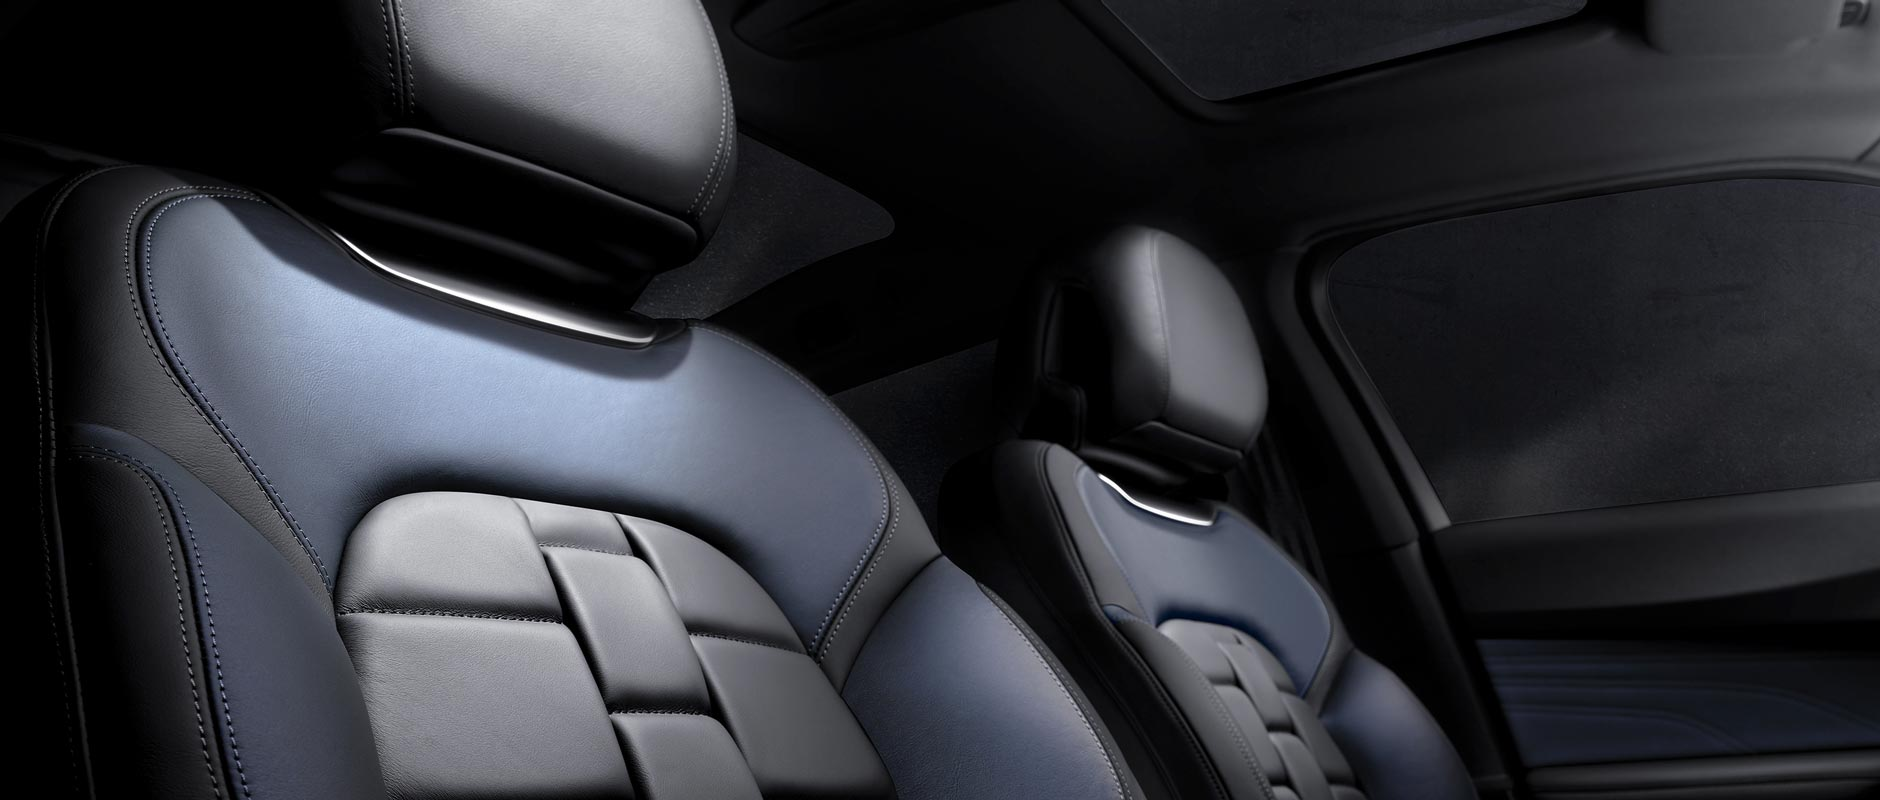 1880X800-New-DS5-Details-iNTER-HauteCouture